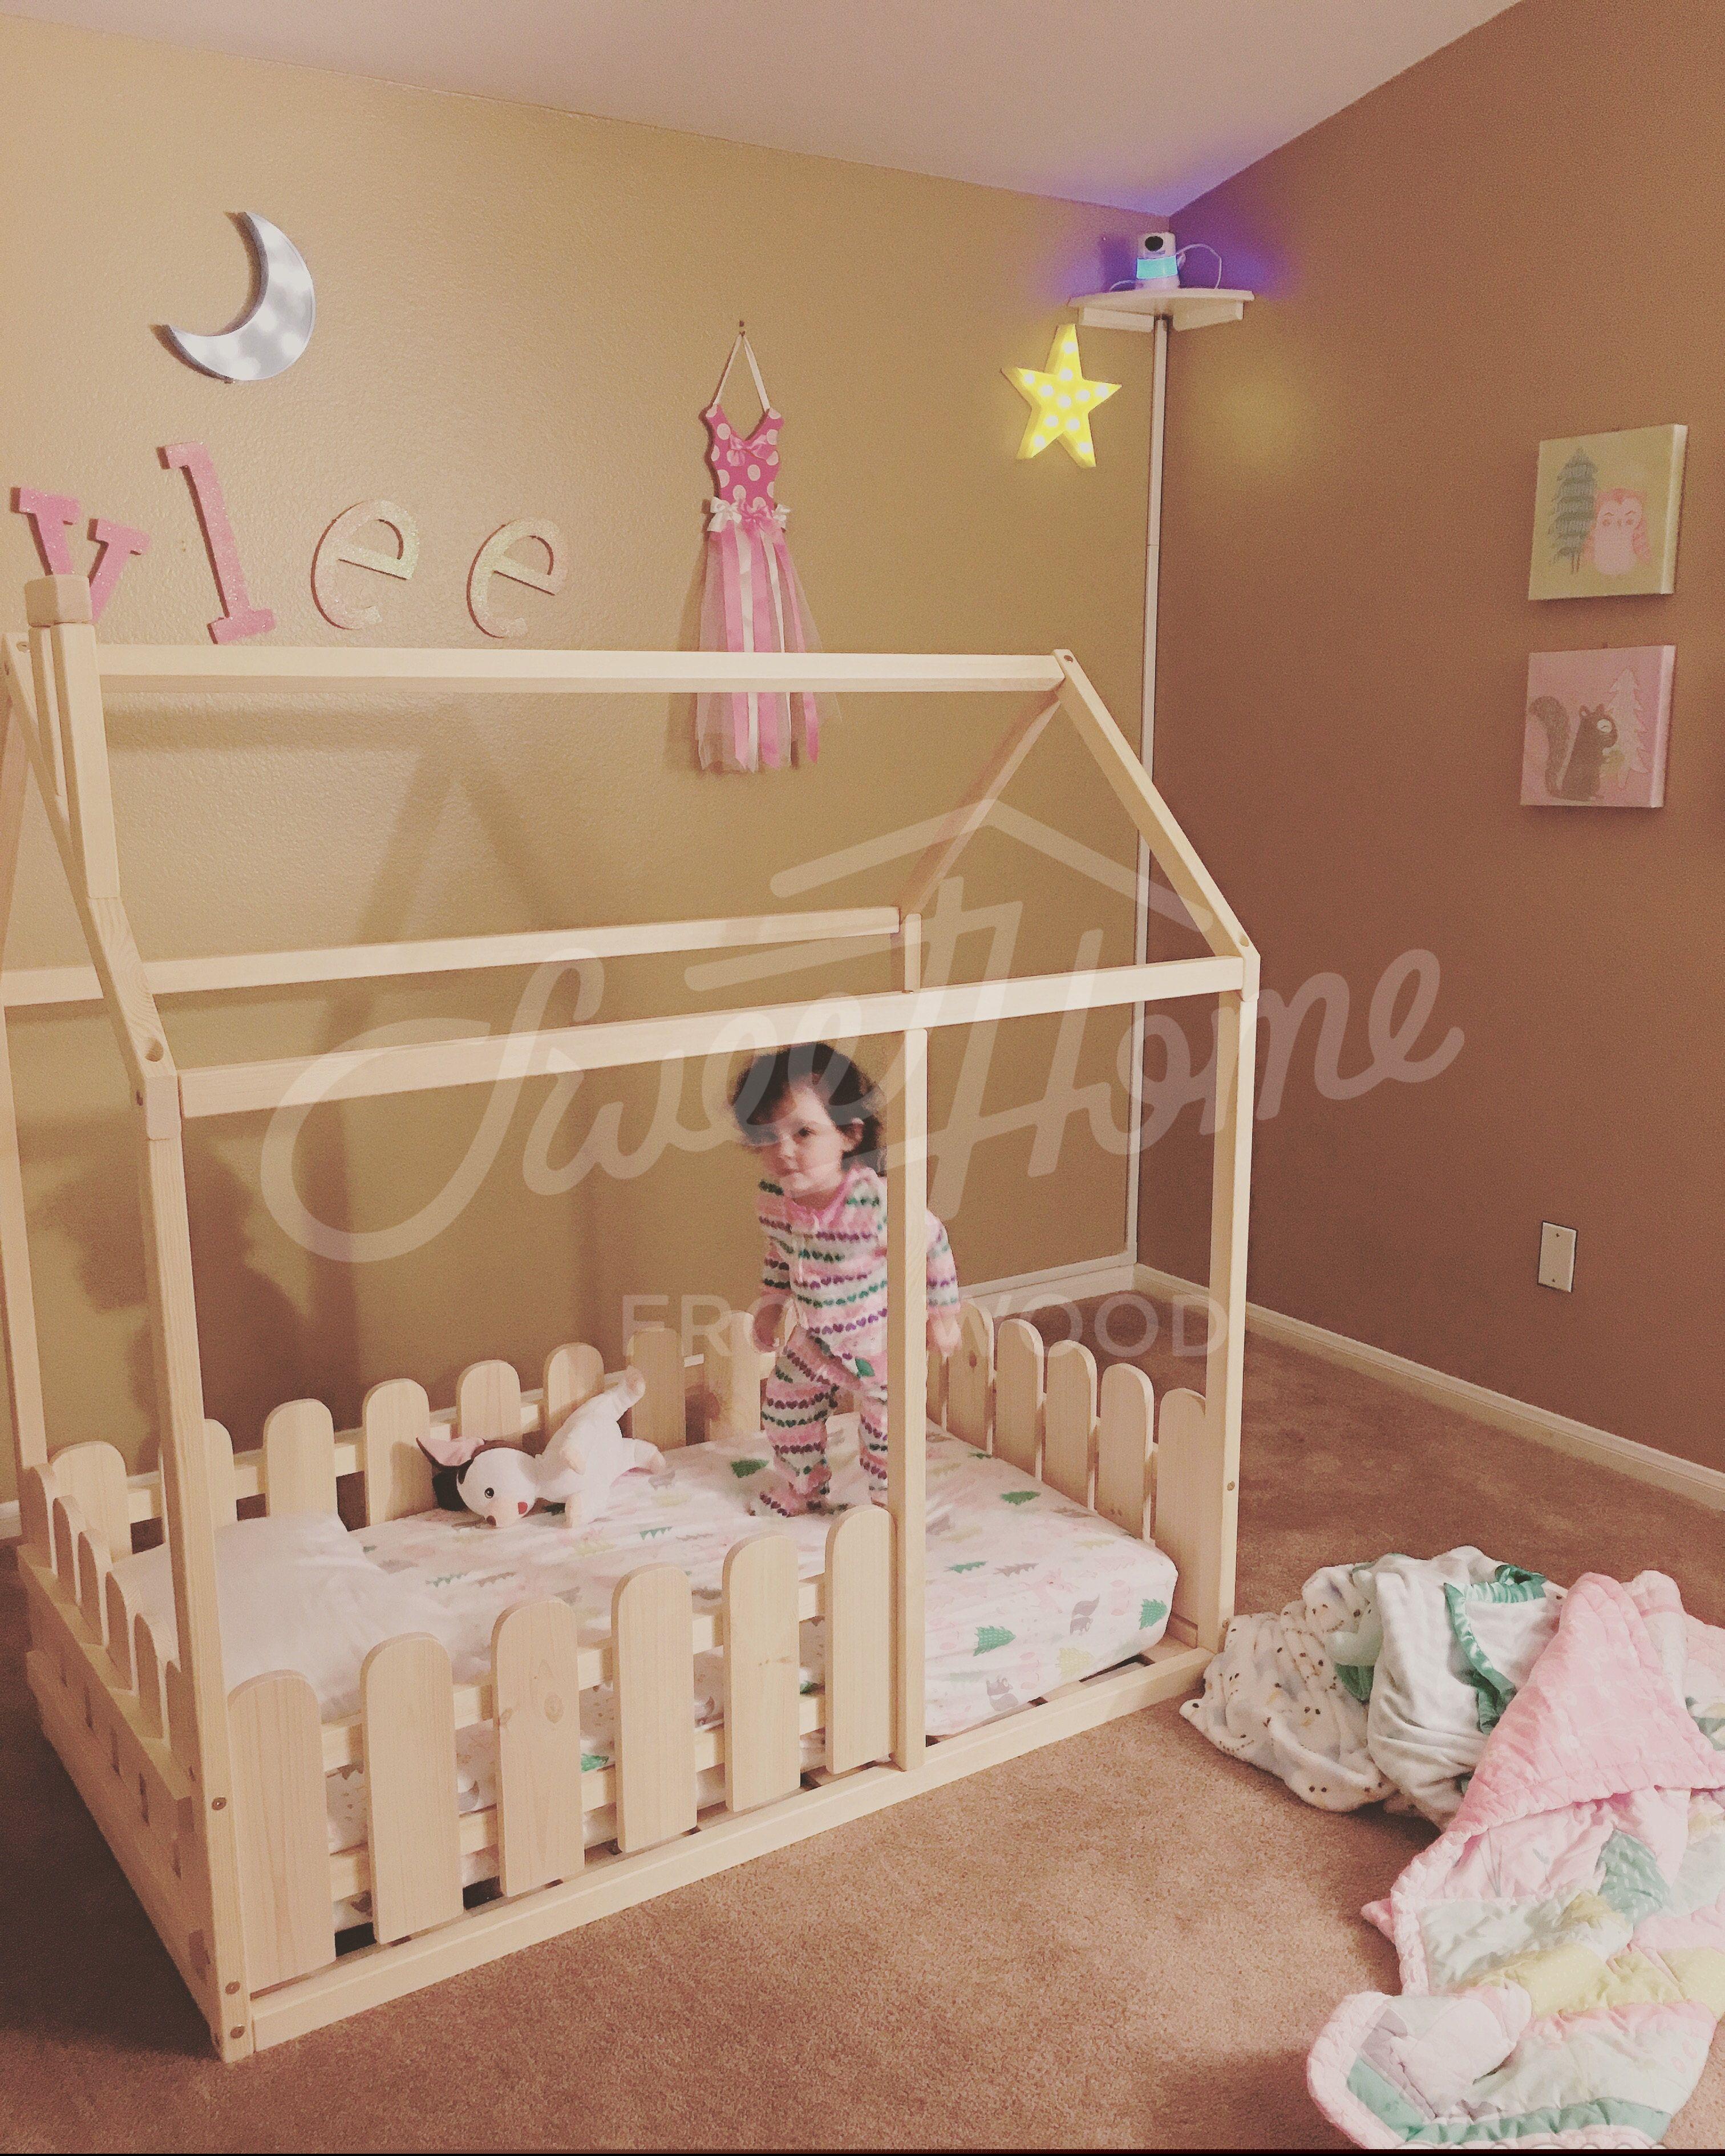 Montessori Bed House Bed Children Bed Toddler Bed Kid Bed Etsy In 2020 Kid Beds Toddler Floor Bed Toddler Bed